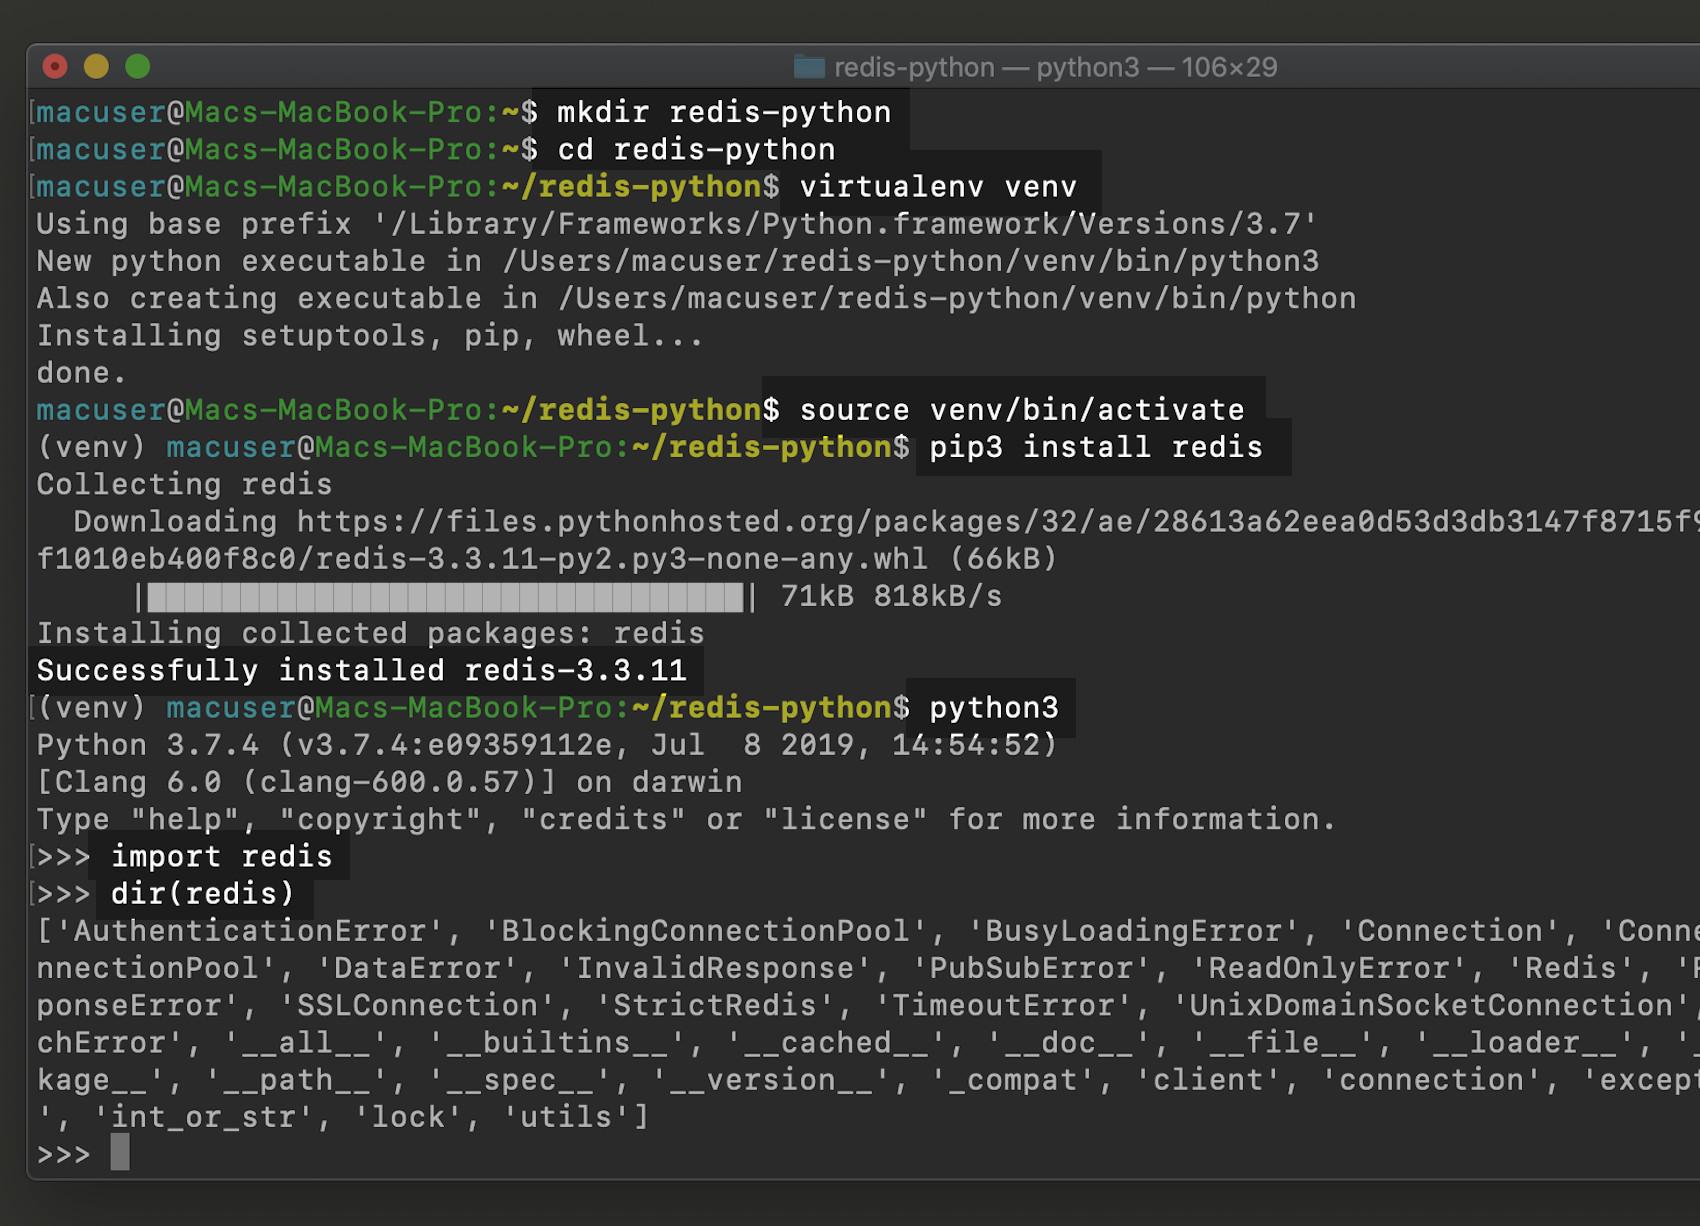 Python virtual environment for a Redis server in macOS terminal